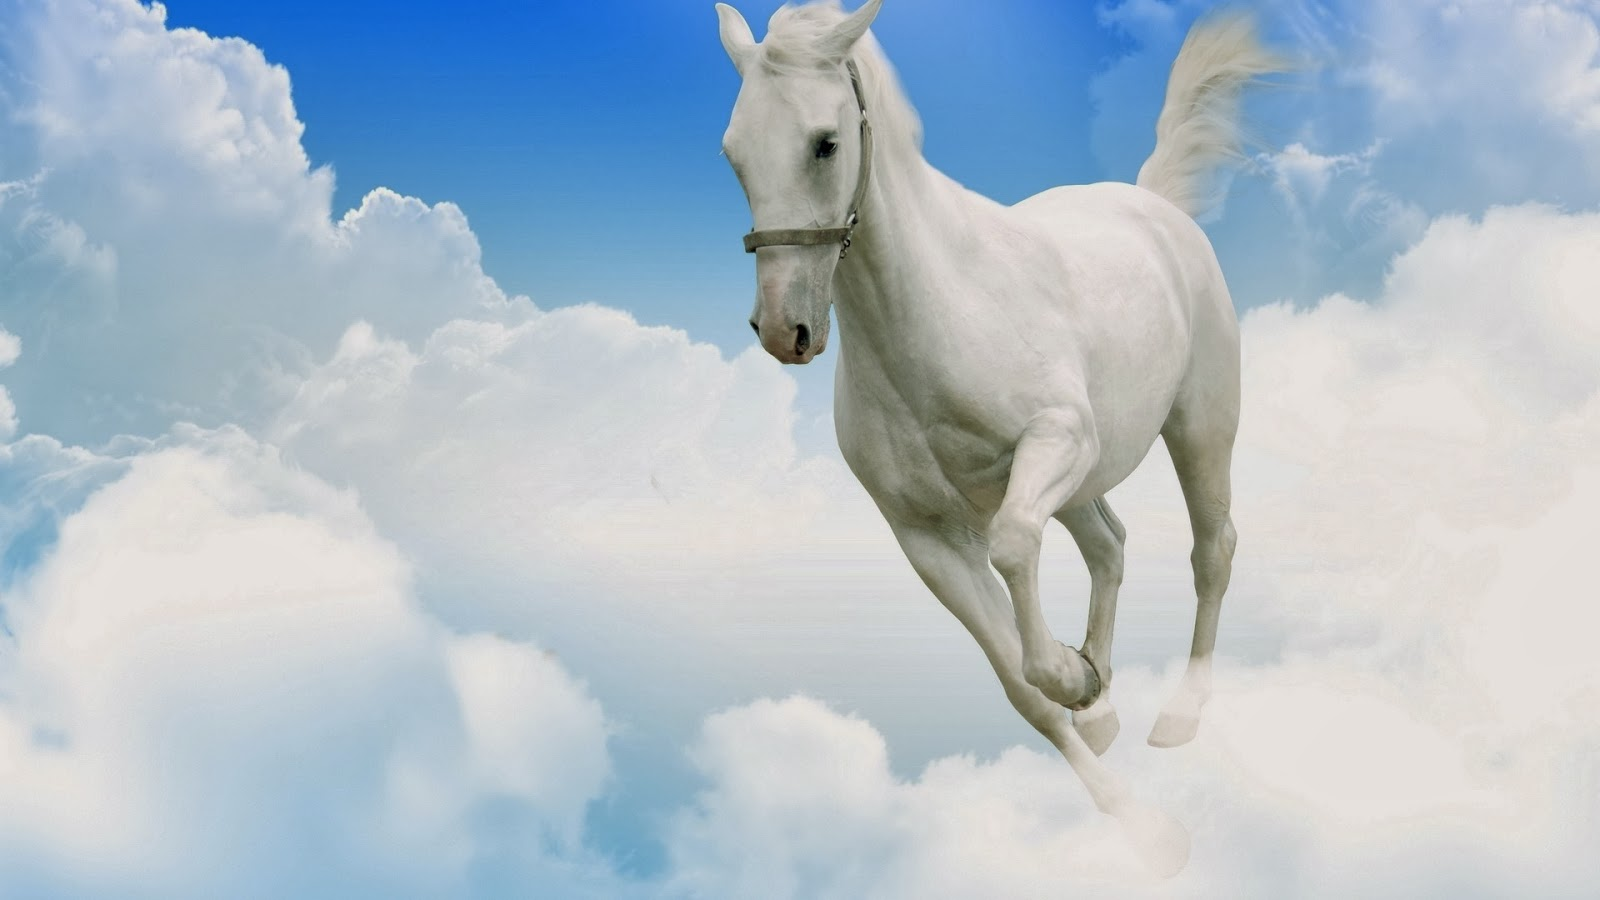 White Horse Wallpapers - beautiful desktop wallpapers 2014